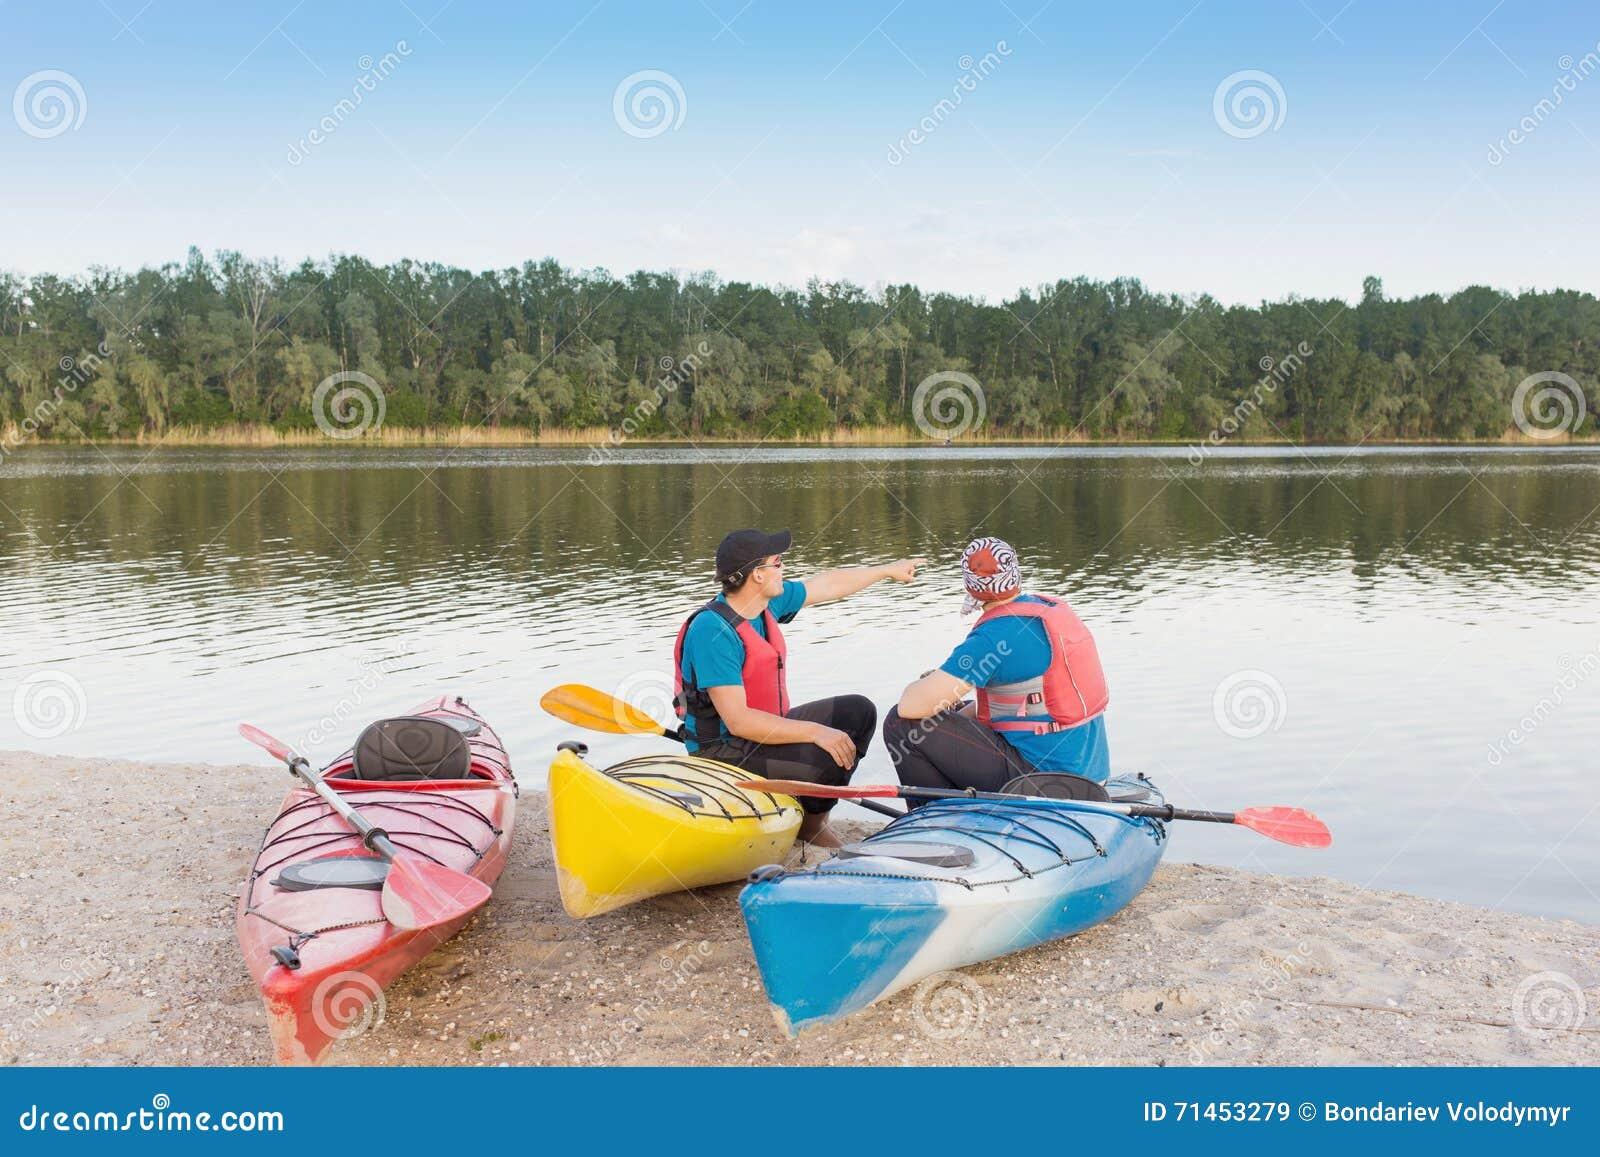 Dos individuos viajan el río en kayaking